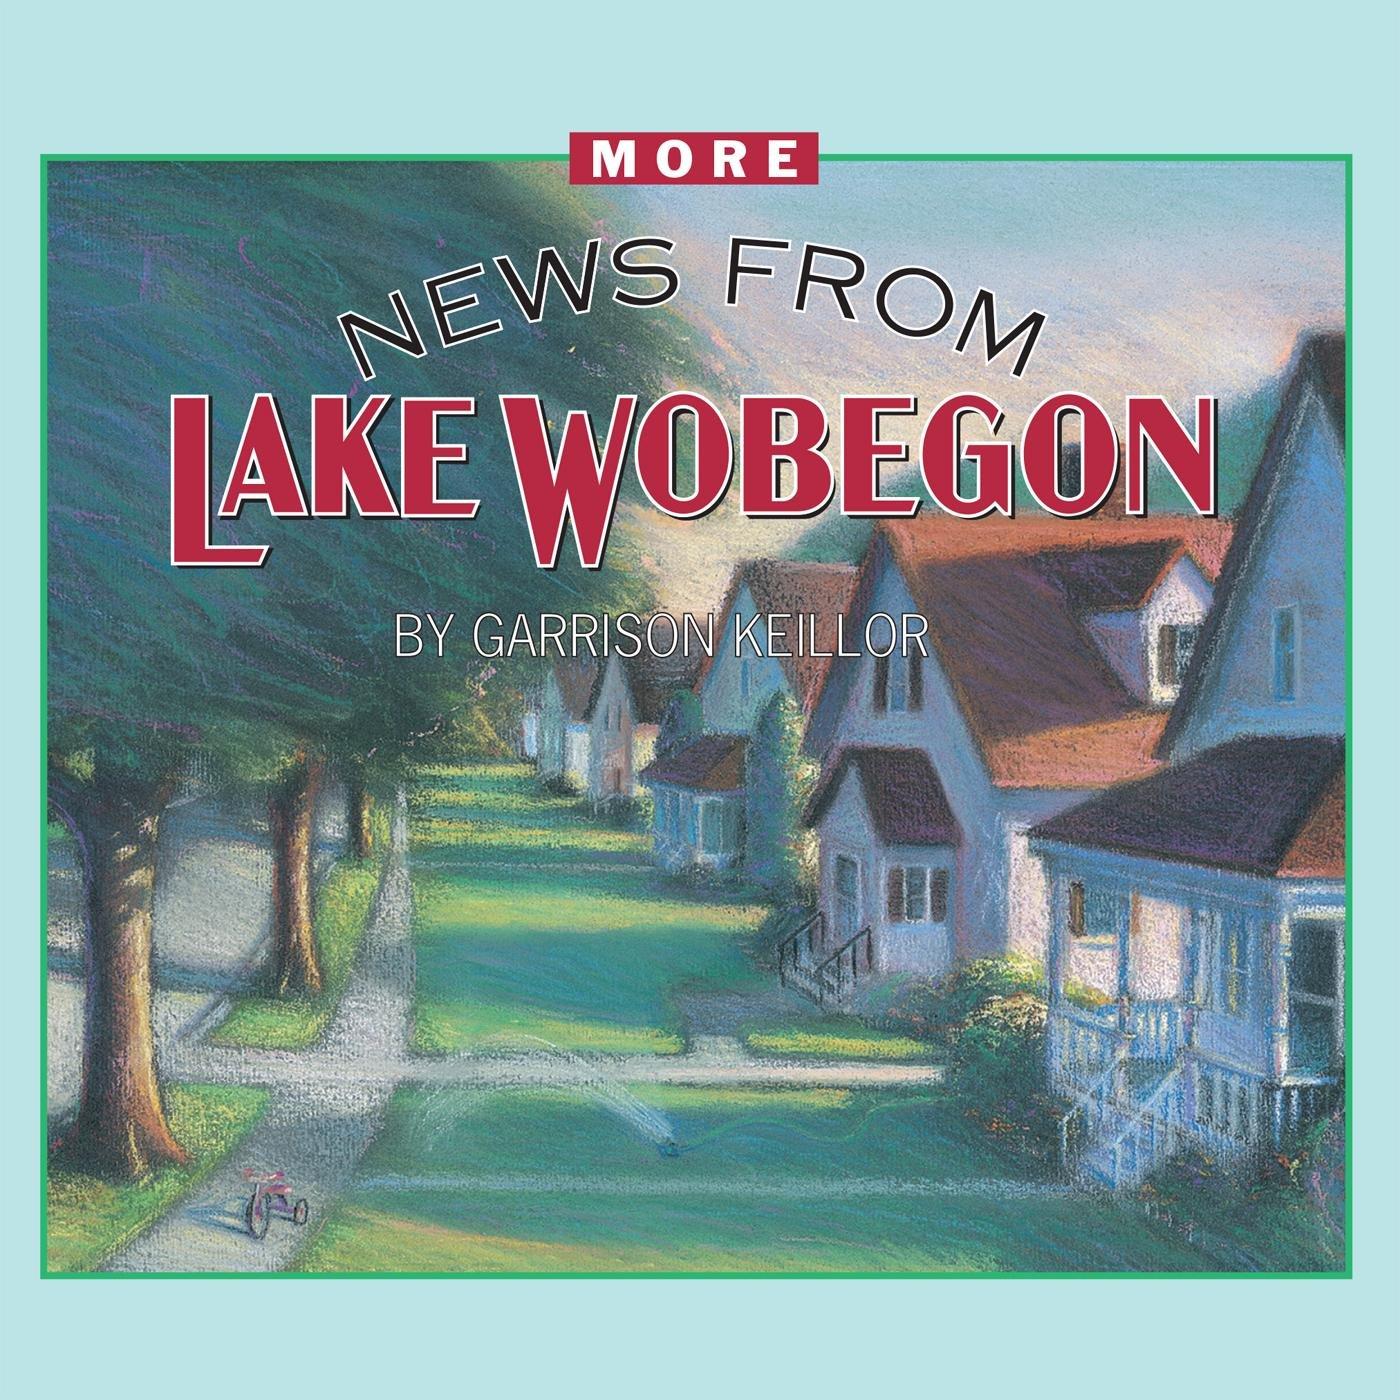 More News from Lake Wobegon by HighBridge Audio